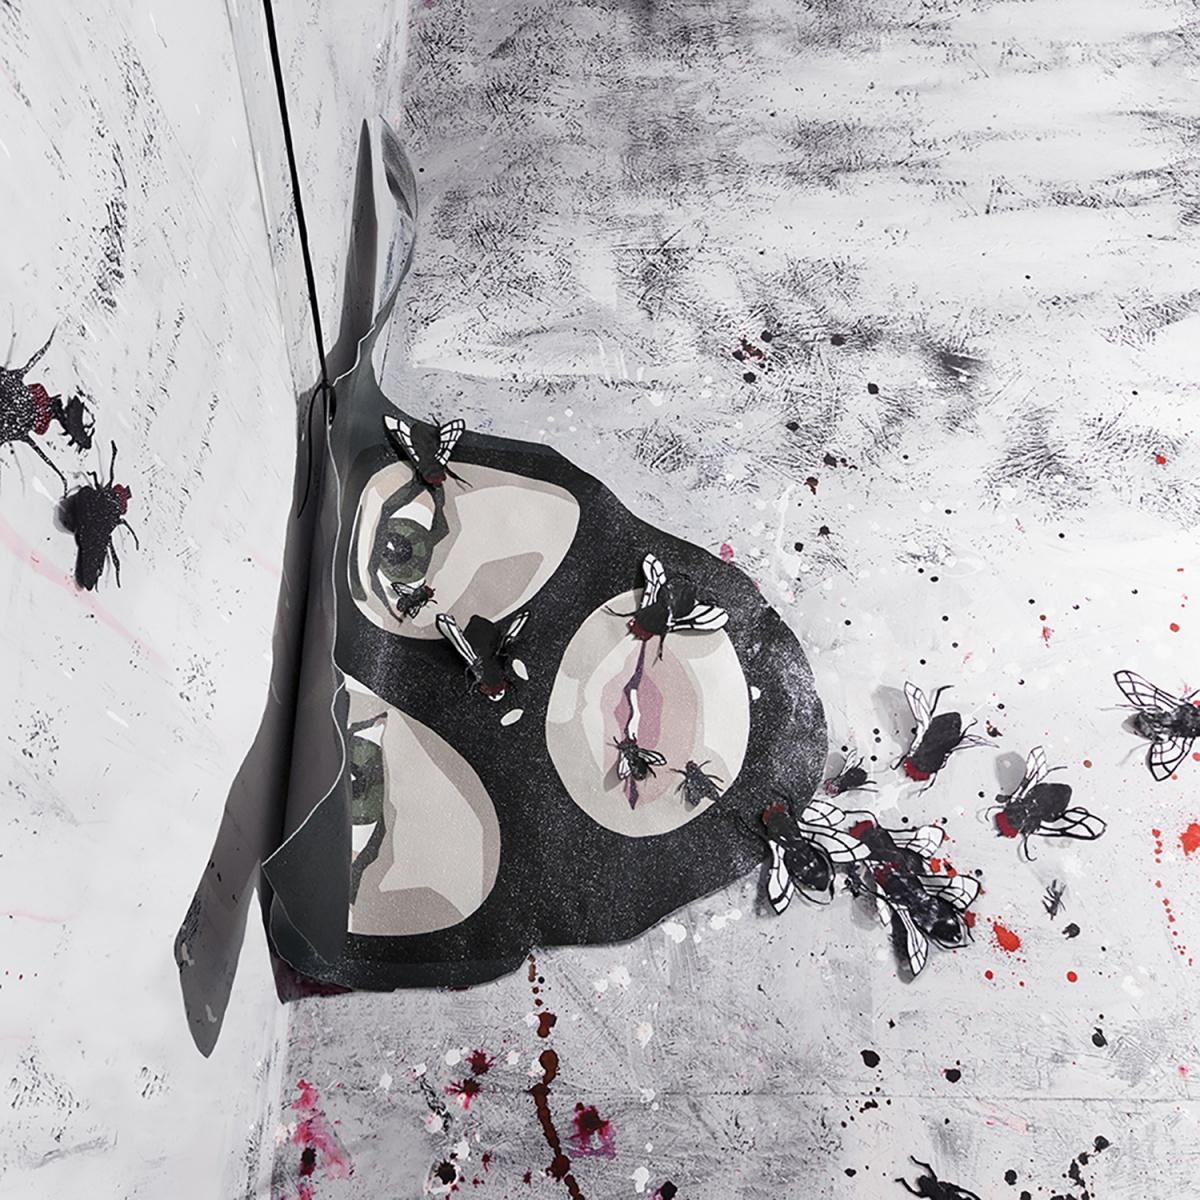 medulla-studio-mercurio-s17s71-pop-art-pelle-dipinto-fotografia